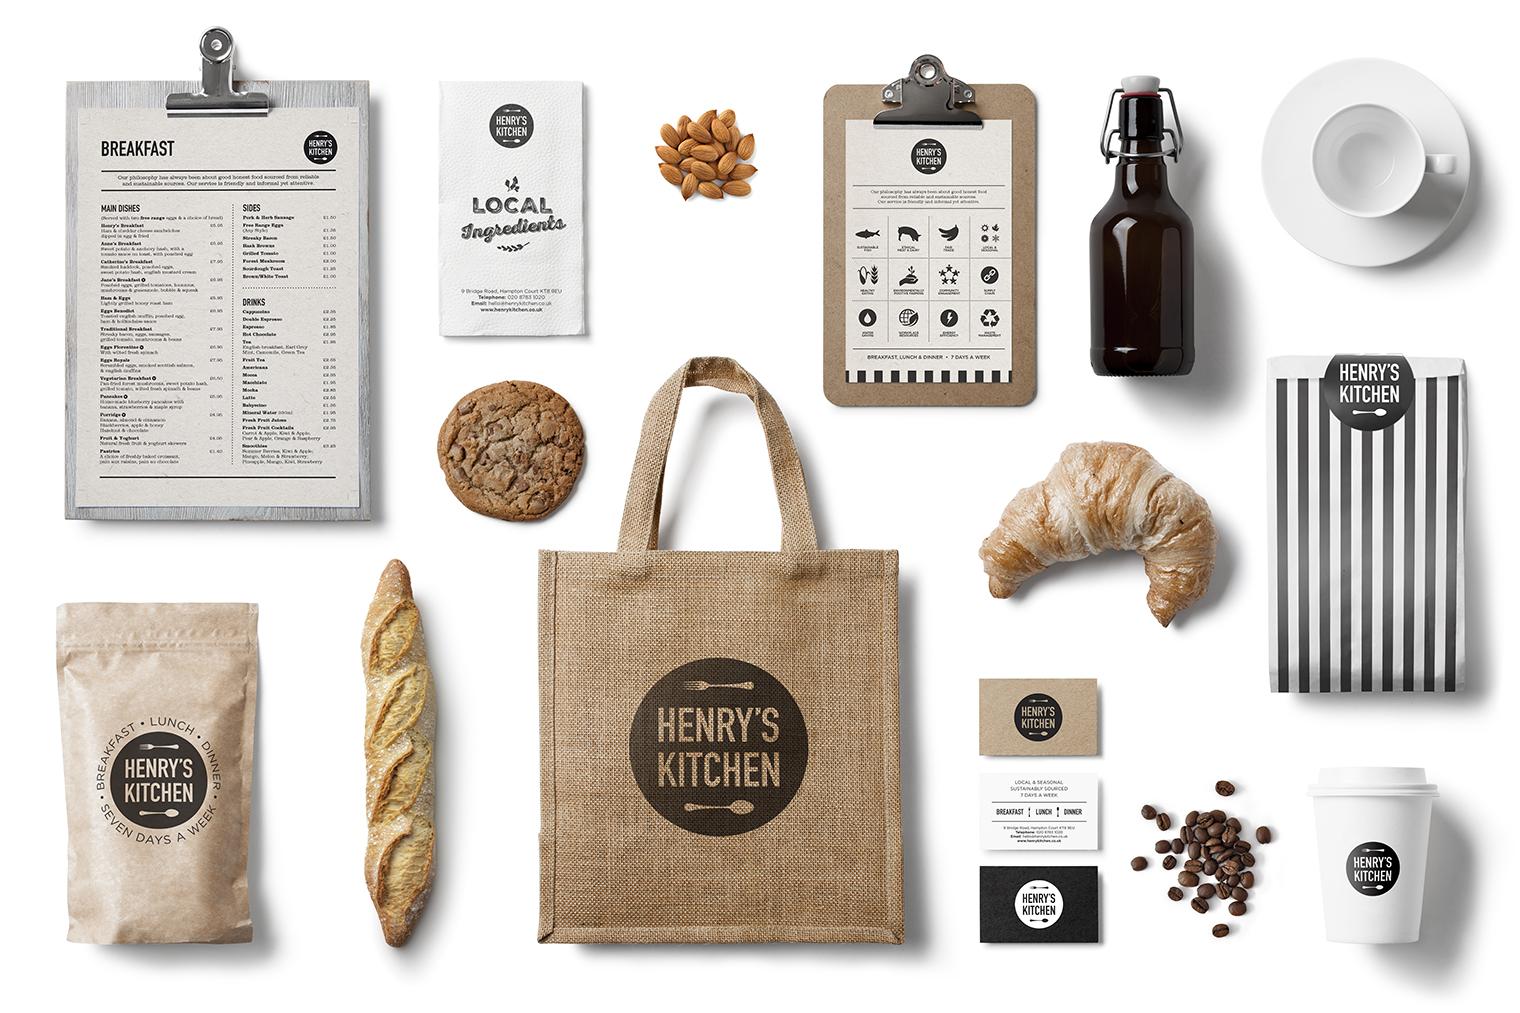 Henrys Kitchen Selection of branded items